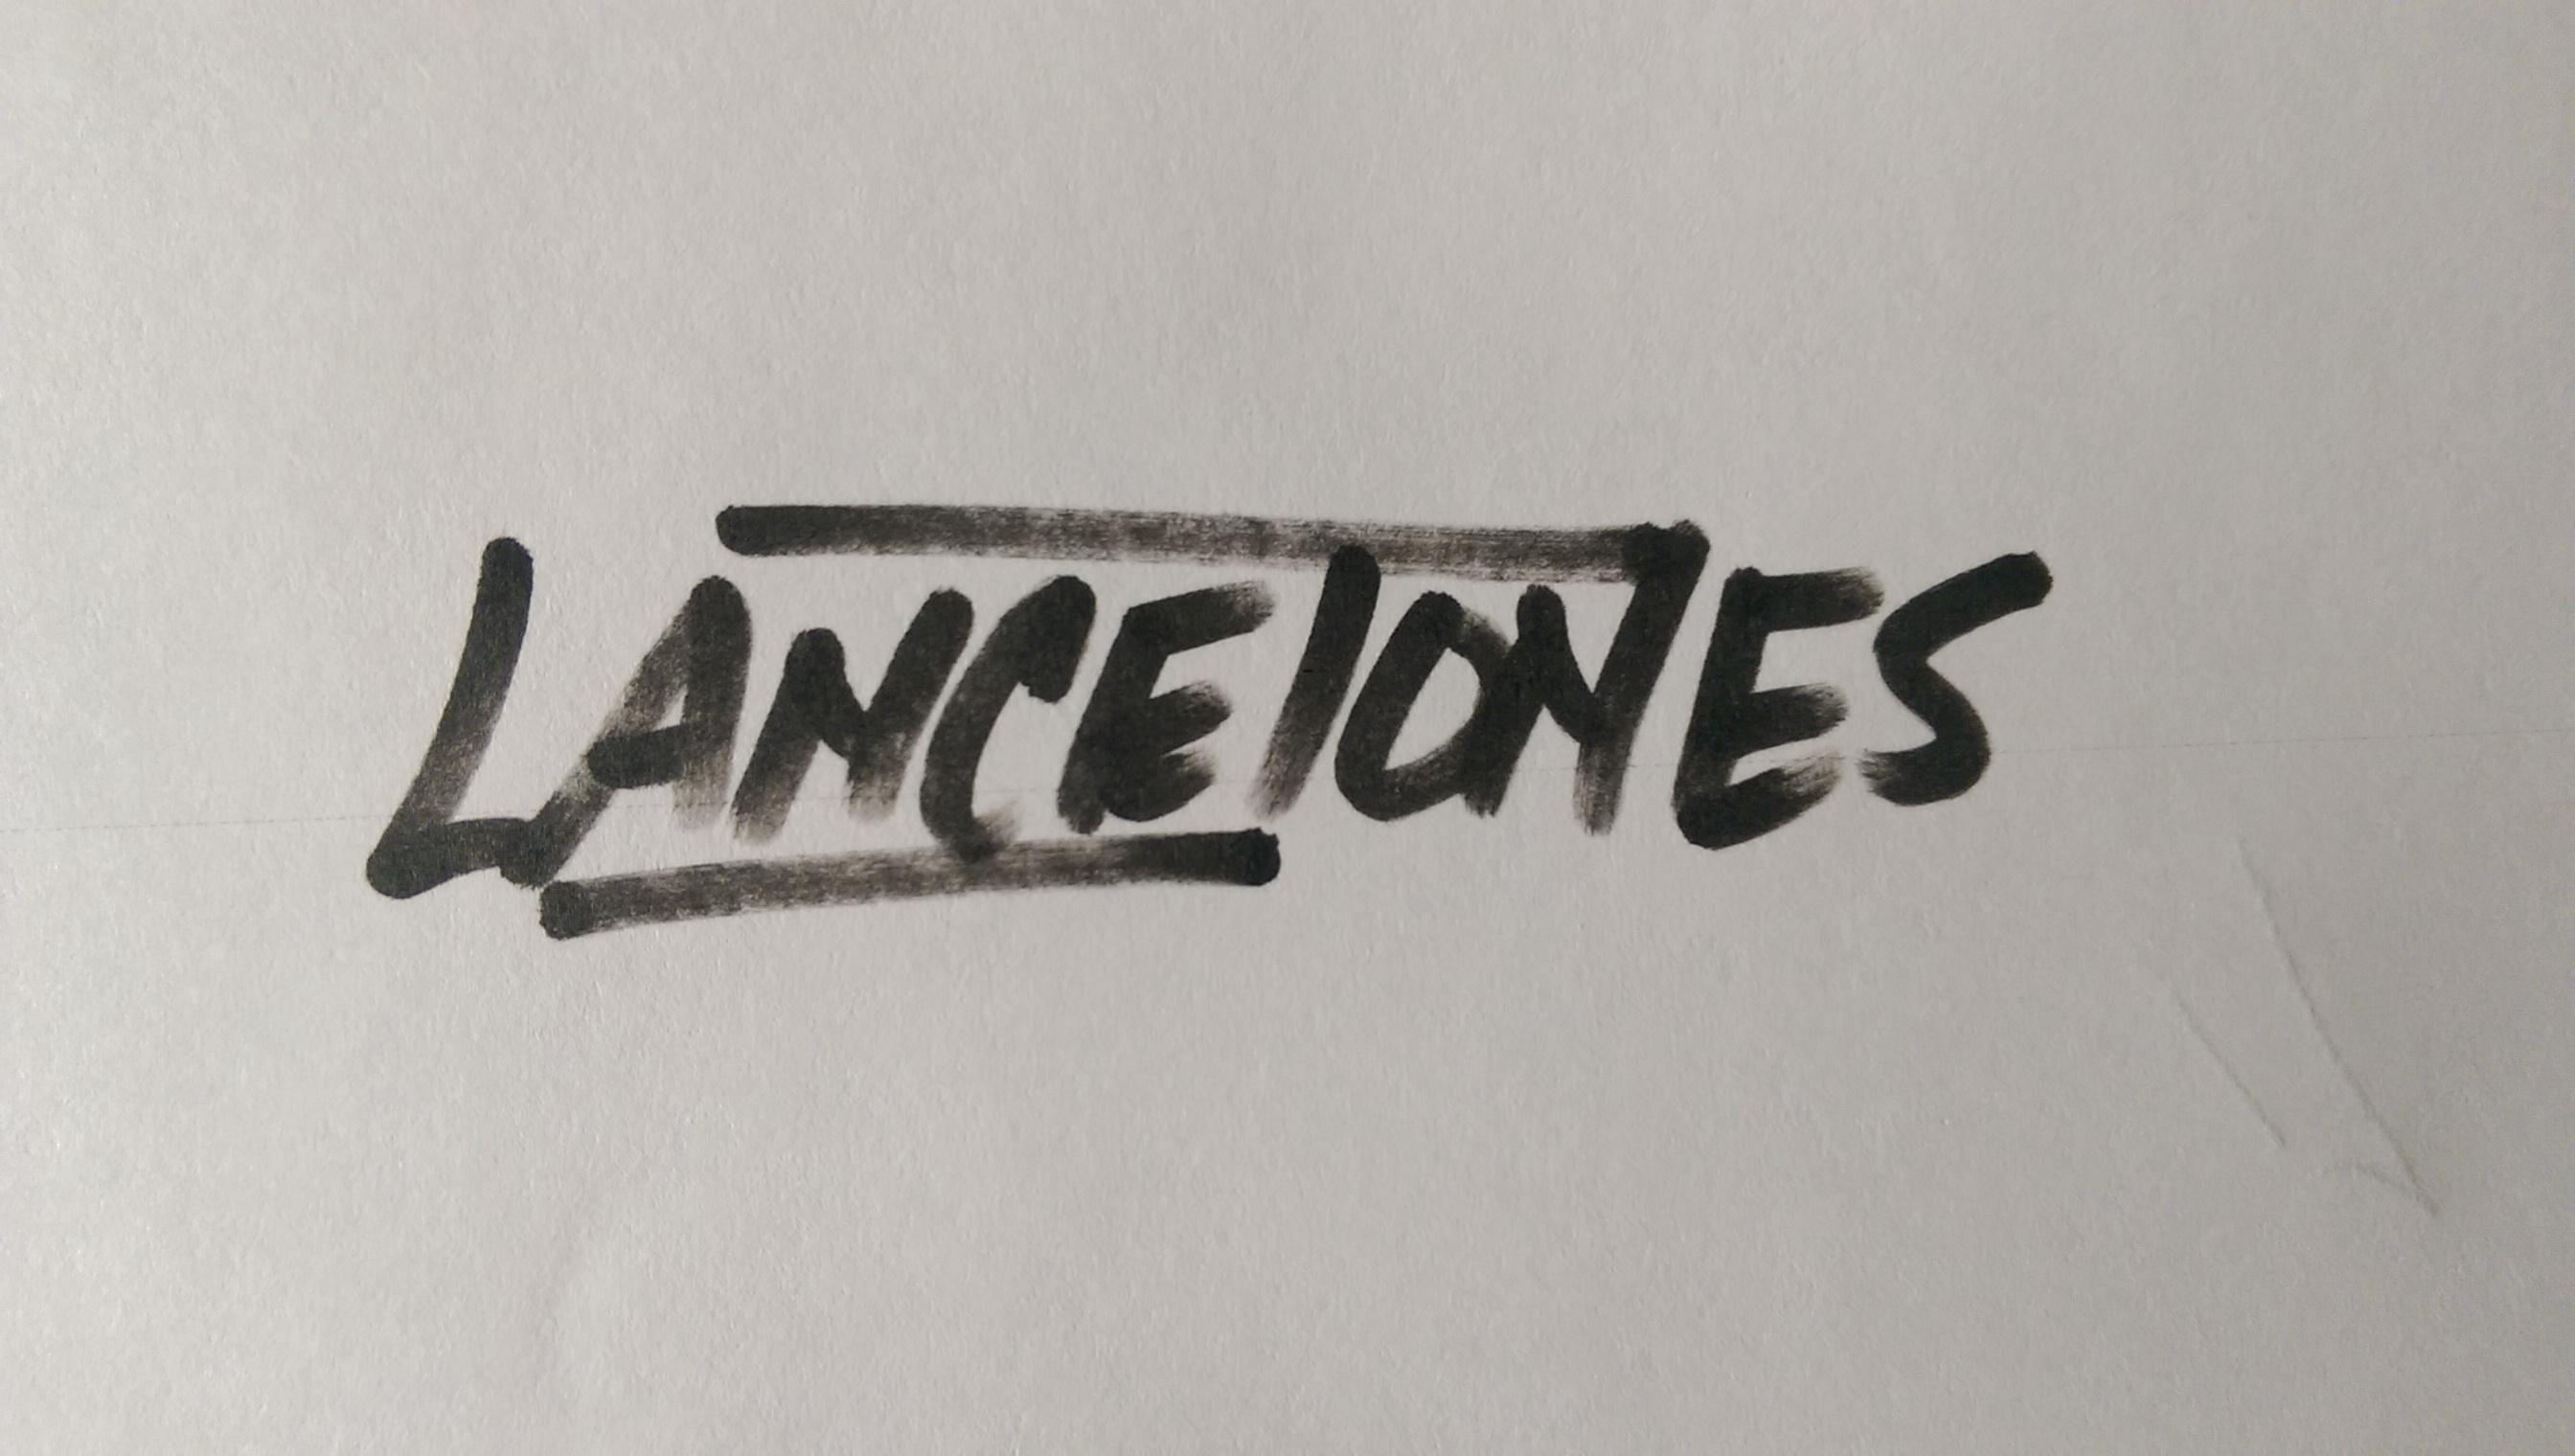 Lance Jones's Signature